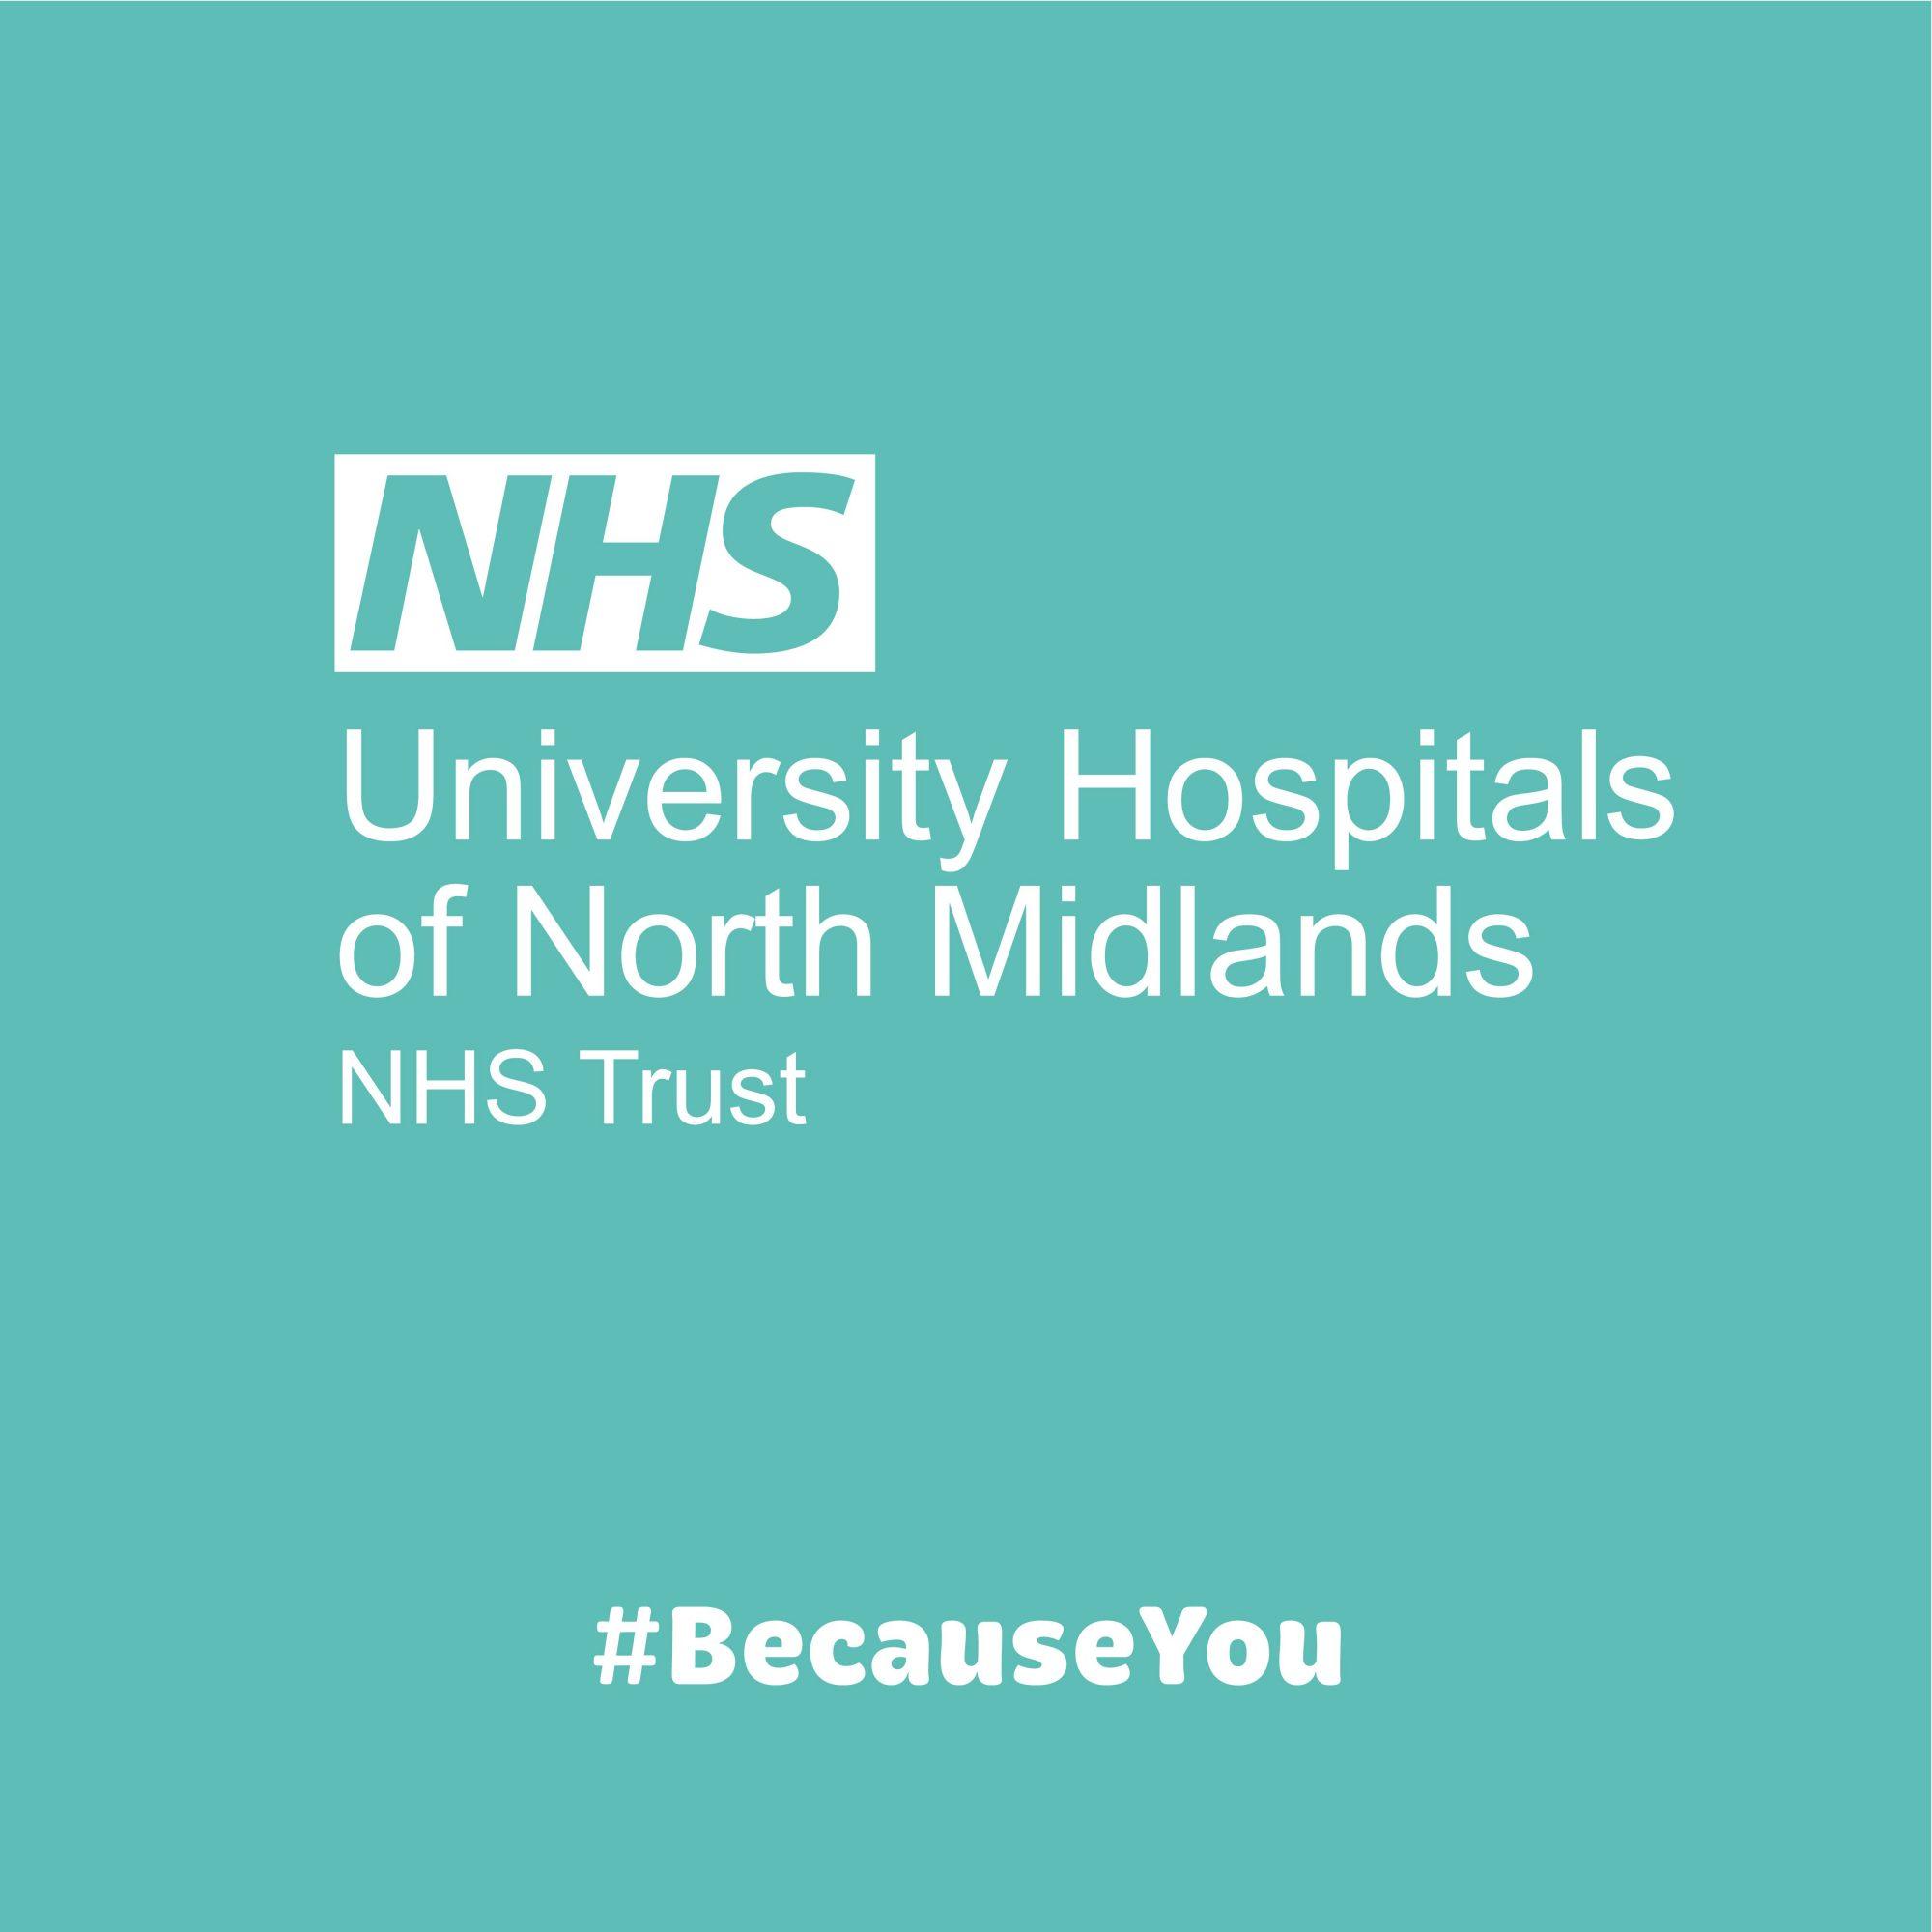 University Hospitals of North Midlands